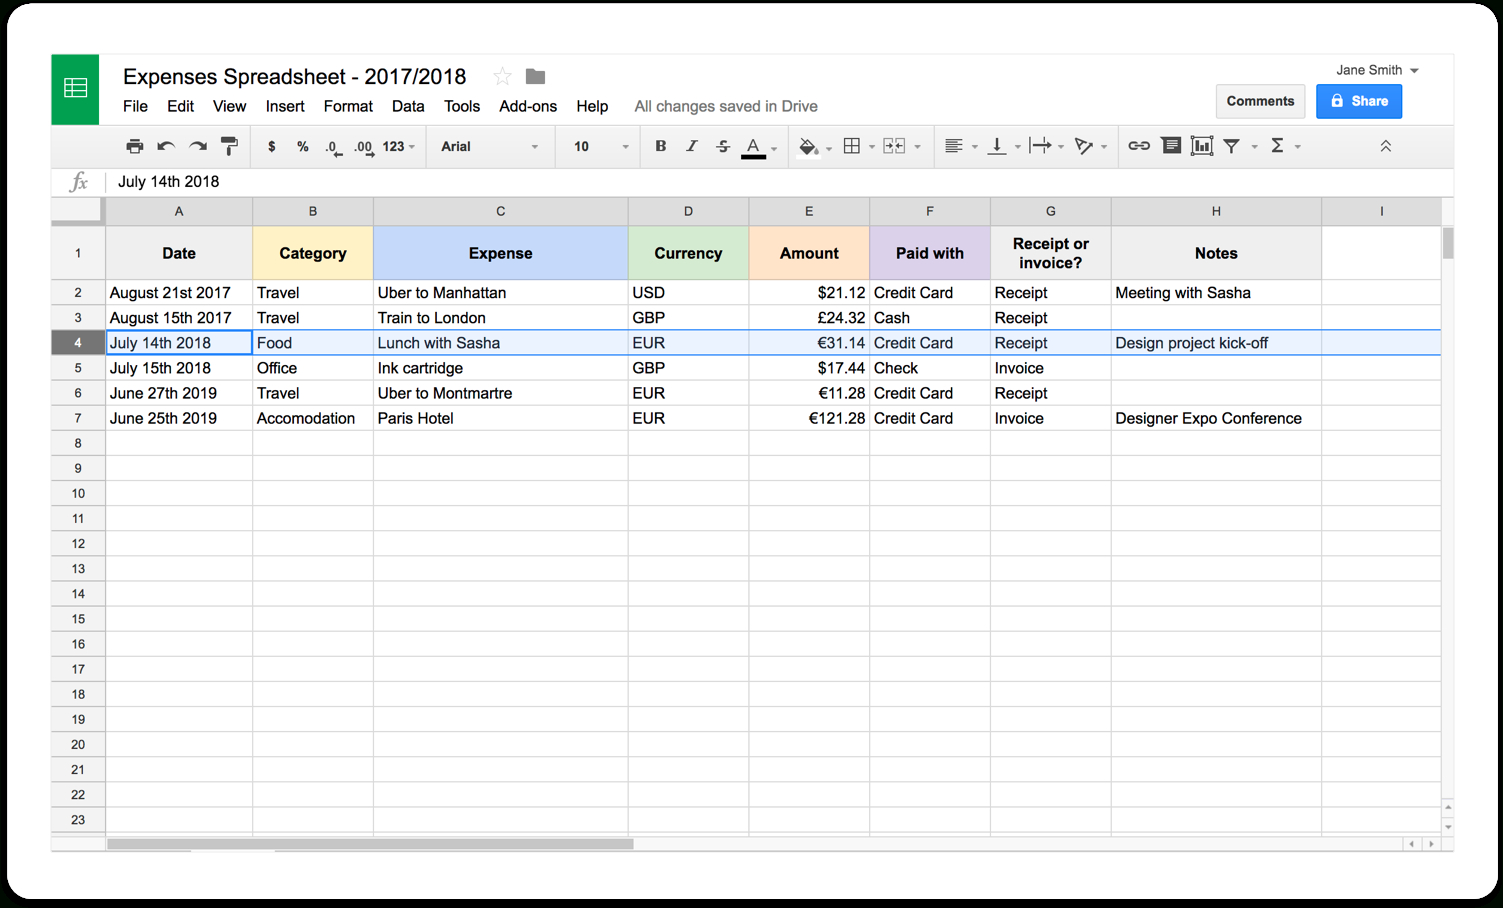 Tax Expenses Spreadsheet With Regard To Self Employed Expense Sheet And Tax Spreadsheet With Expenses Free